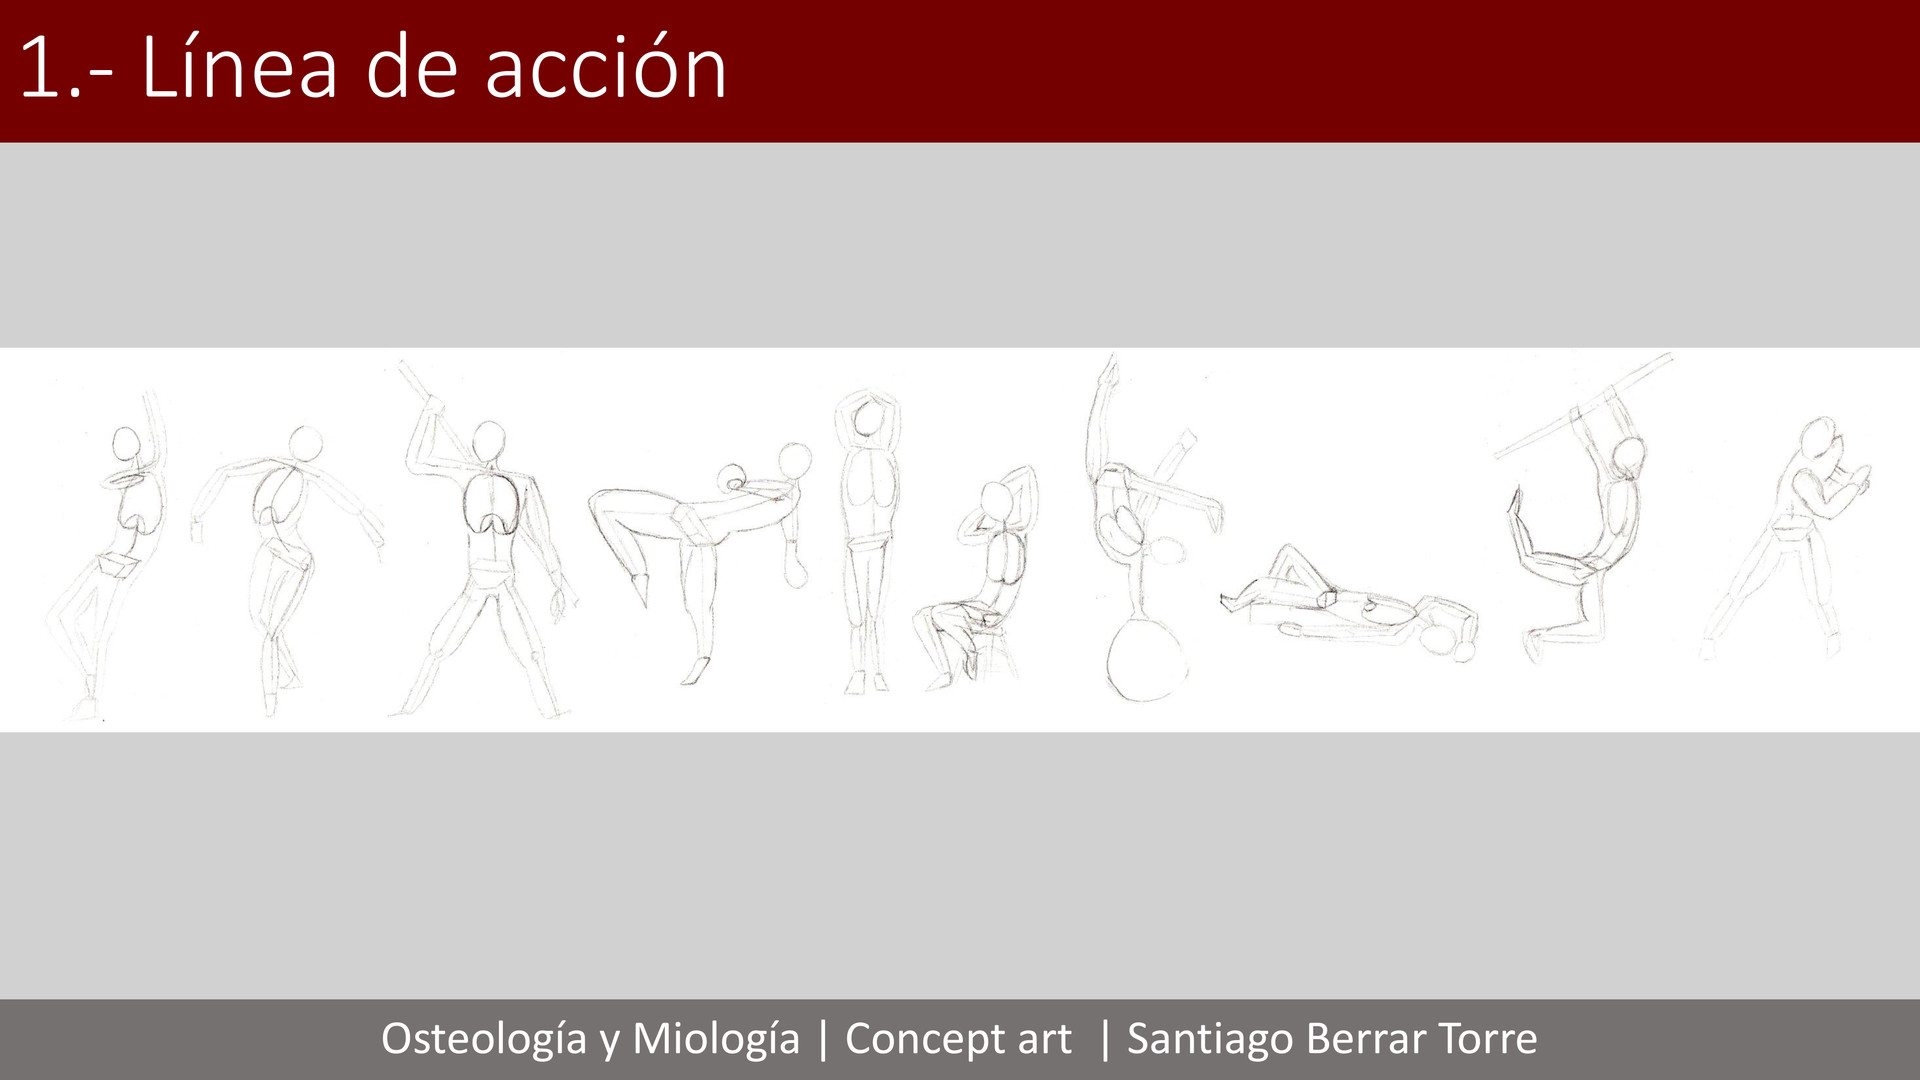 ArtStation - Anatomía, Santiago Berrar